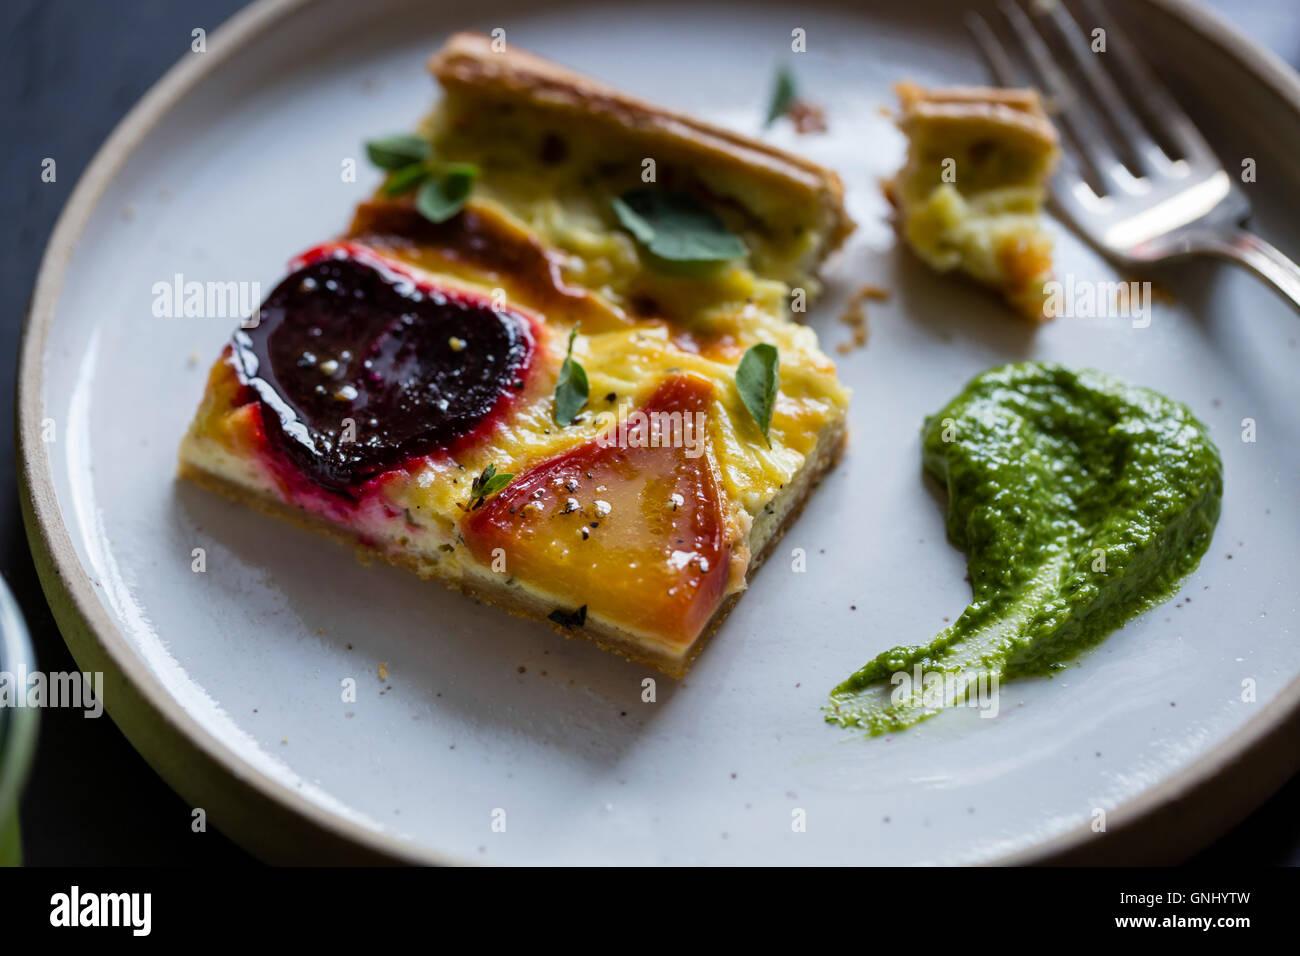 Beetroot ricotta cheese tart with beet greens pesto. Stock Photo